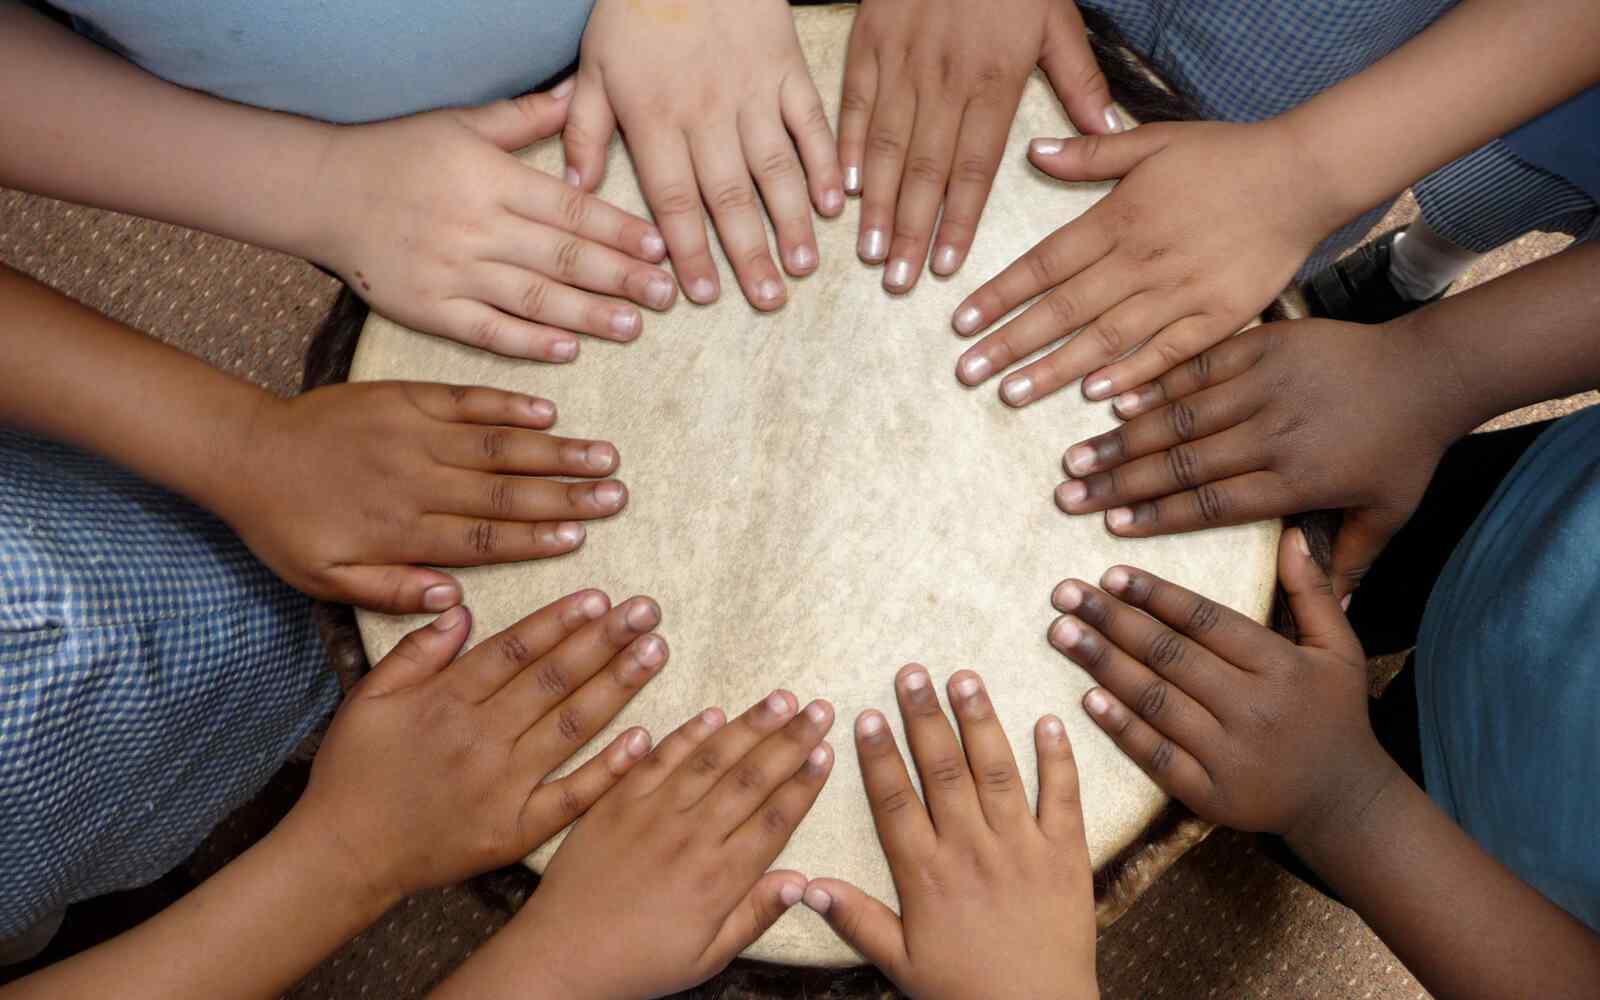 Hands of children on a djembe drum